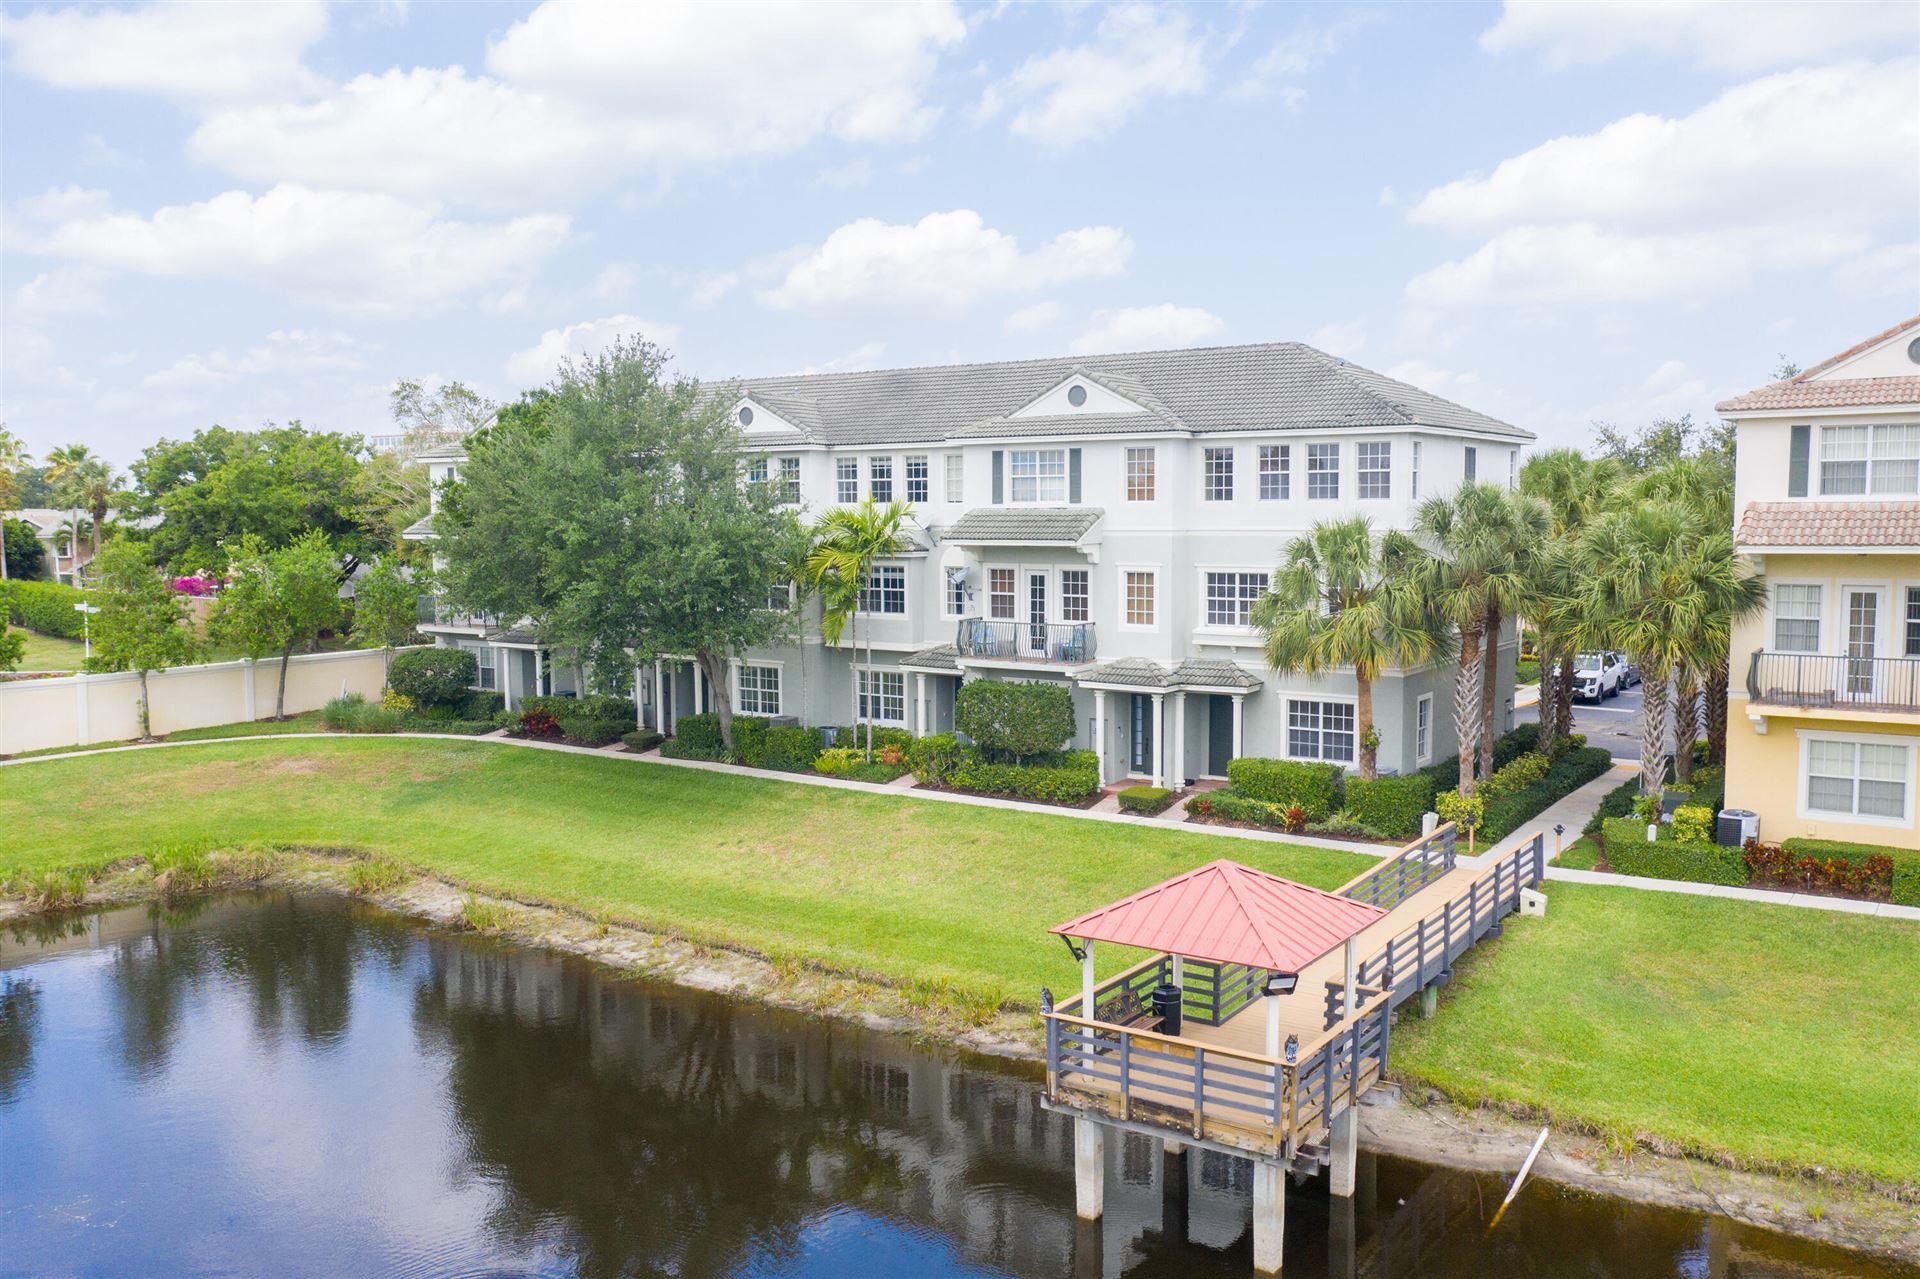 1856 NW 9th Street, Boca Raton, FL 33486 - MLS#: RX-10709322